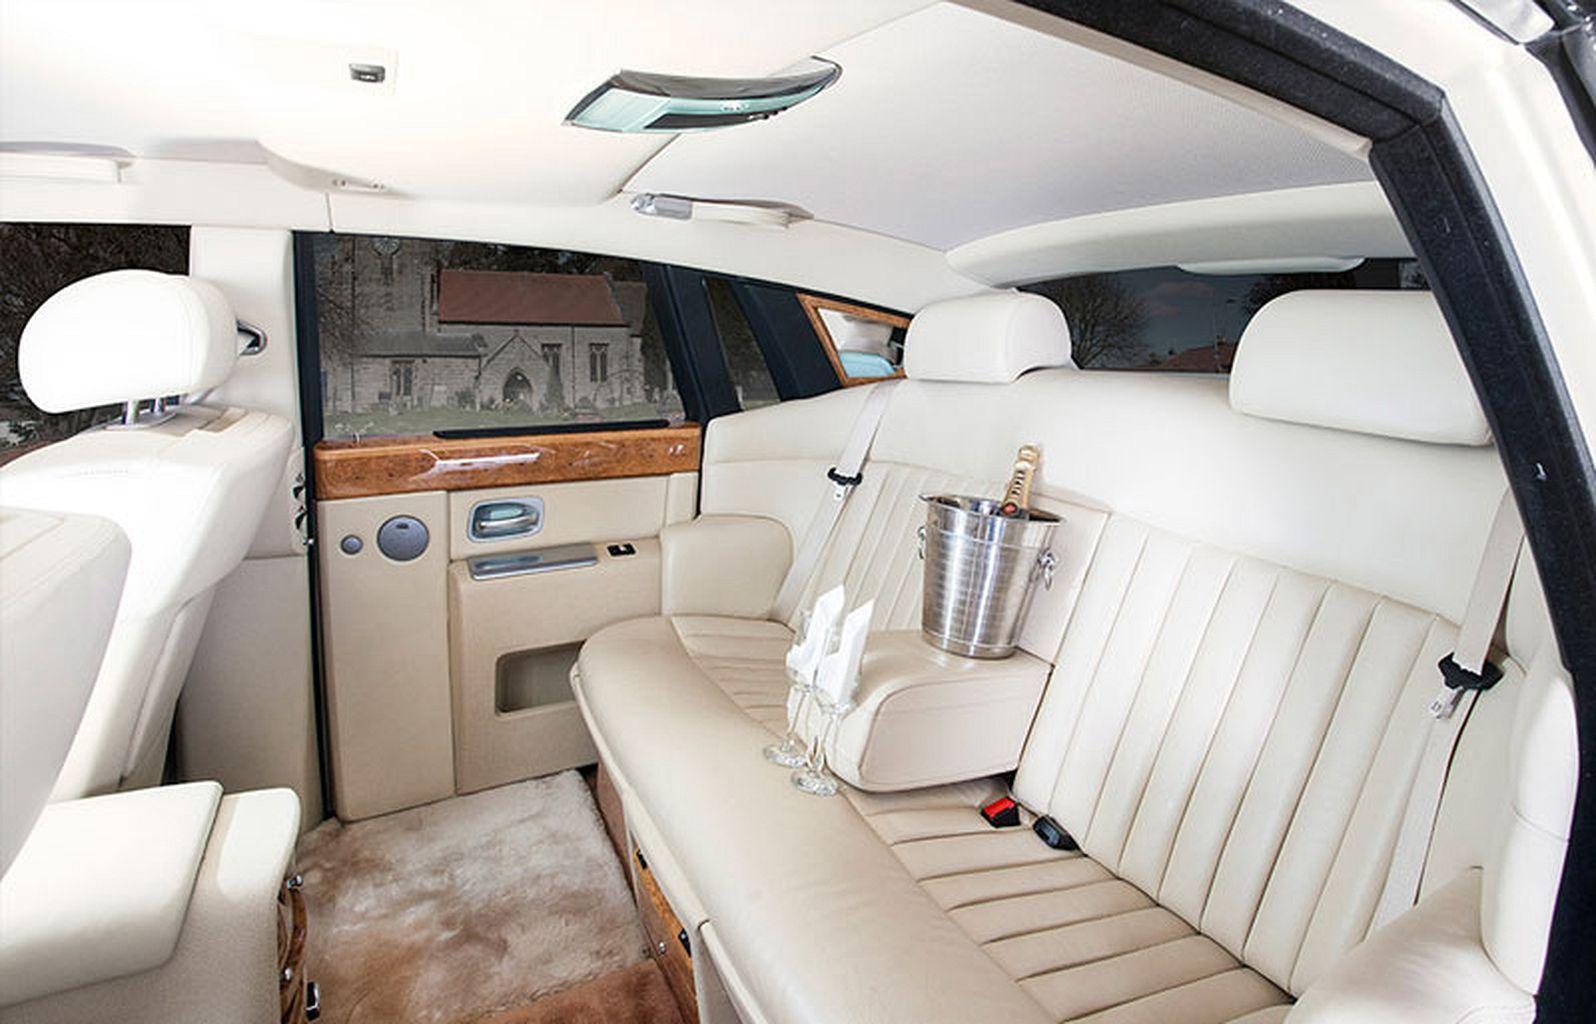 Rolls Royce Phantom Seri II Interior 2017